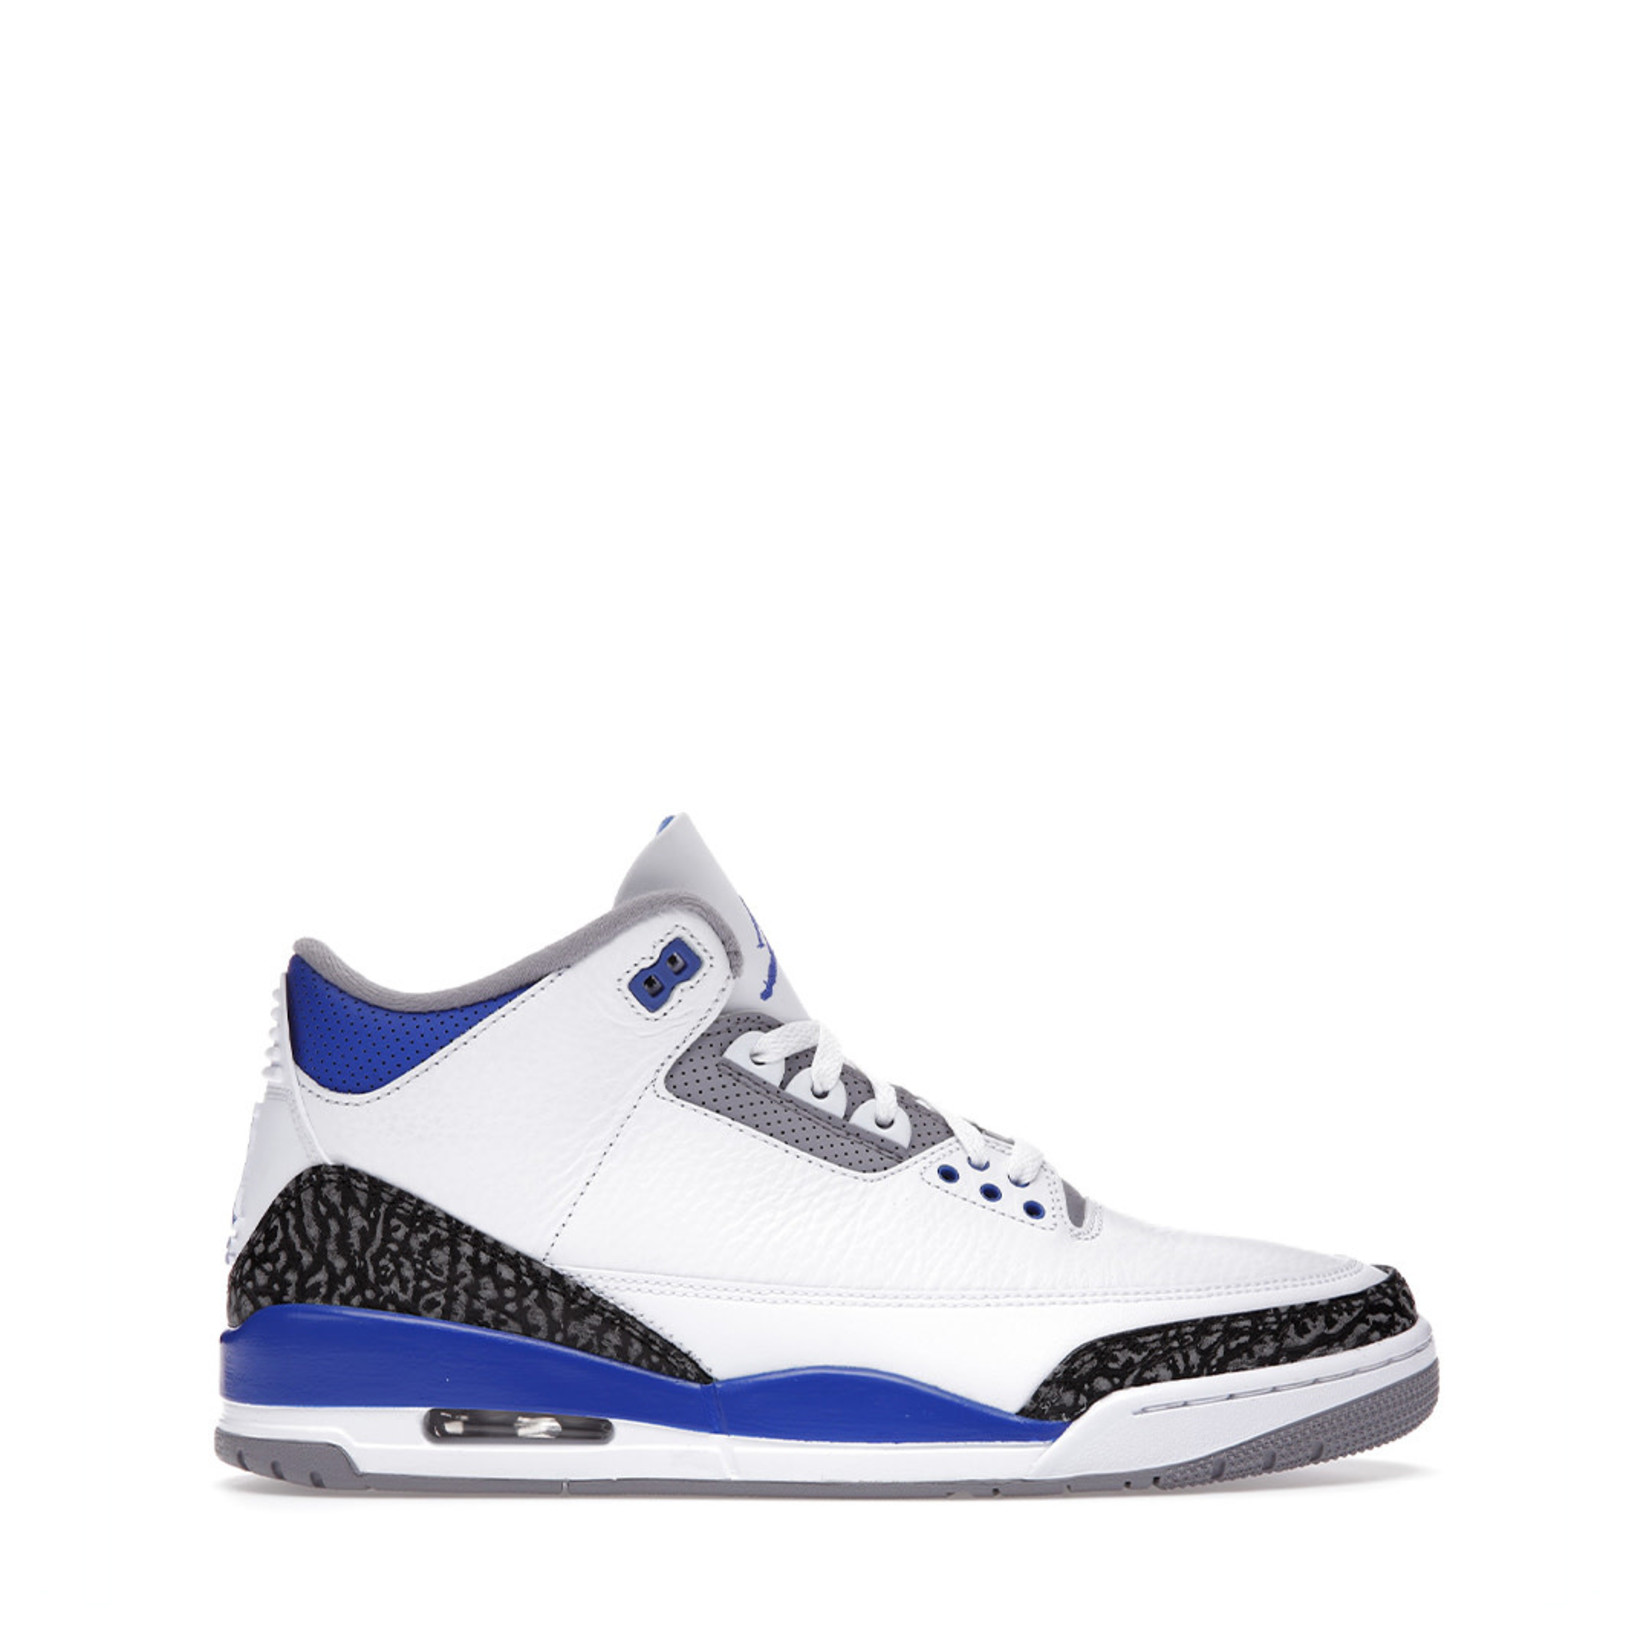 Jordan Jordan 3 Retro Racer Blue (C)